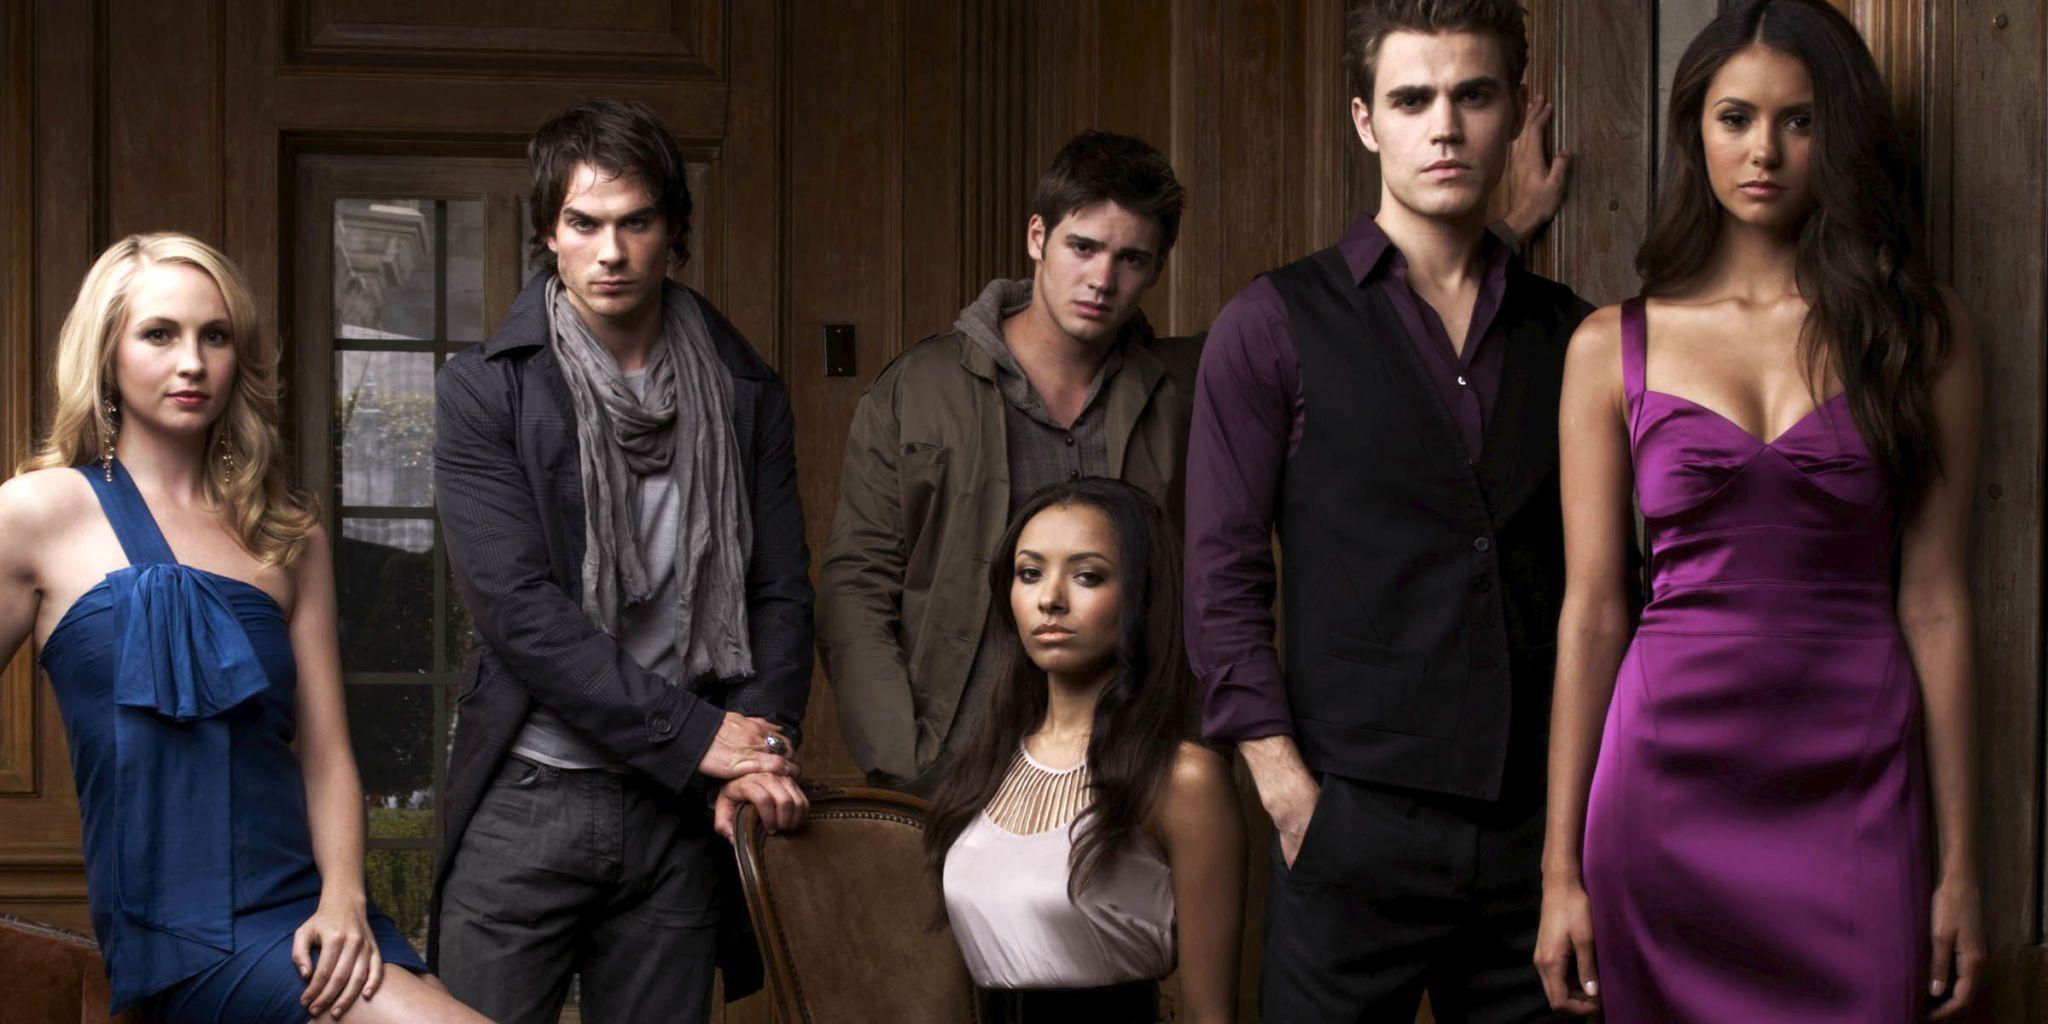 How much do vampire diaries actors make